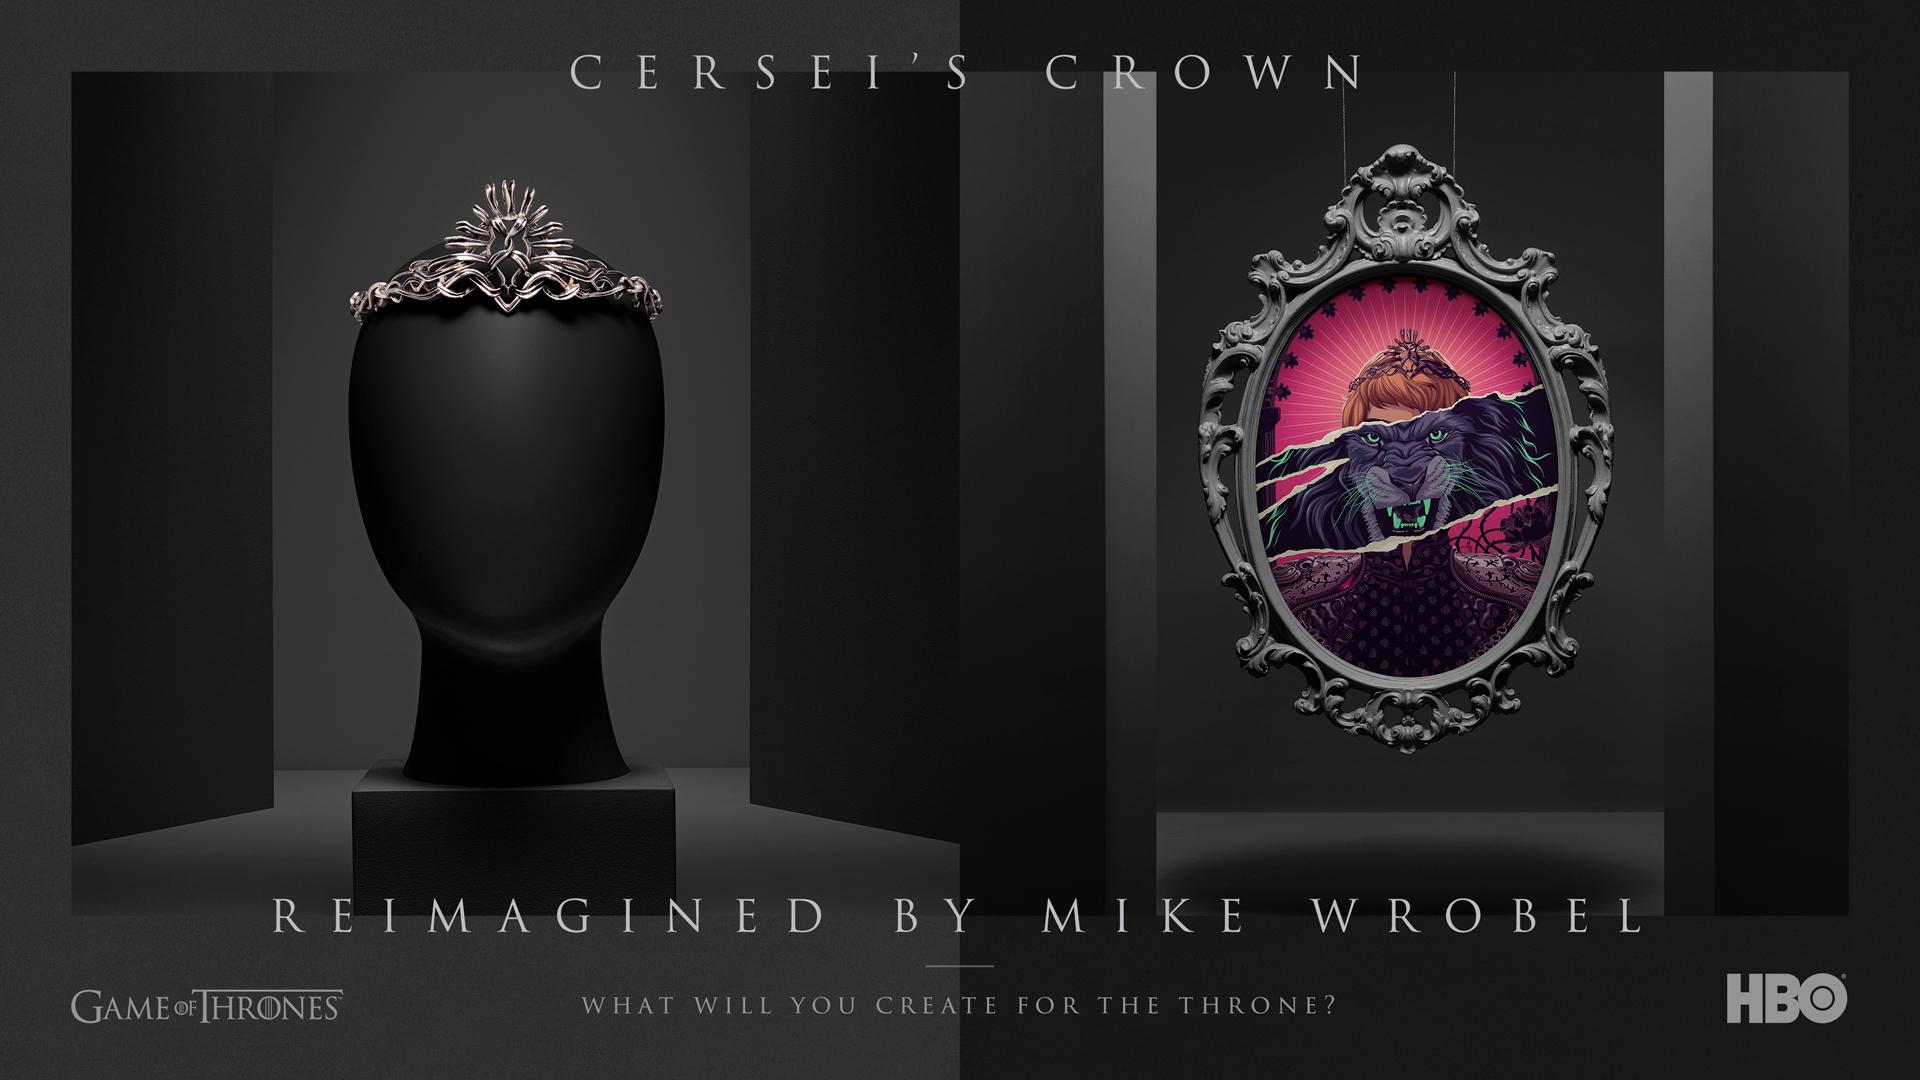 14_FASHION_Cerseis_Crown_Mike_Wrobel.jpg